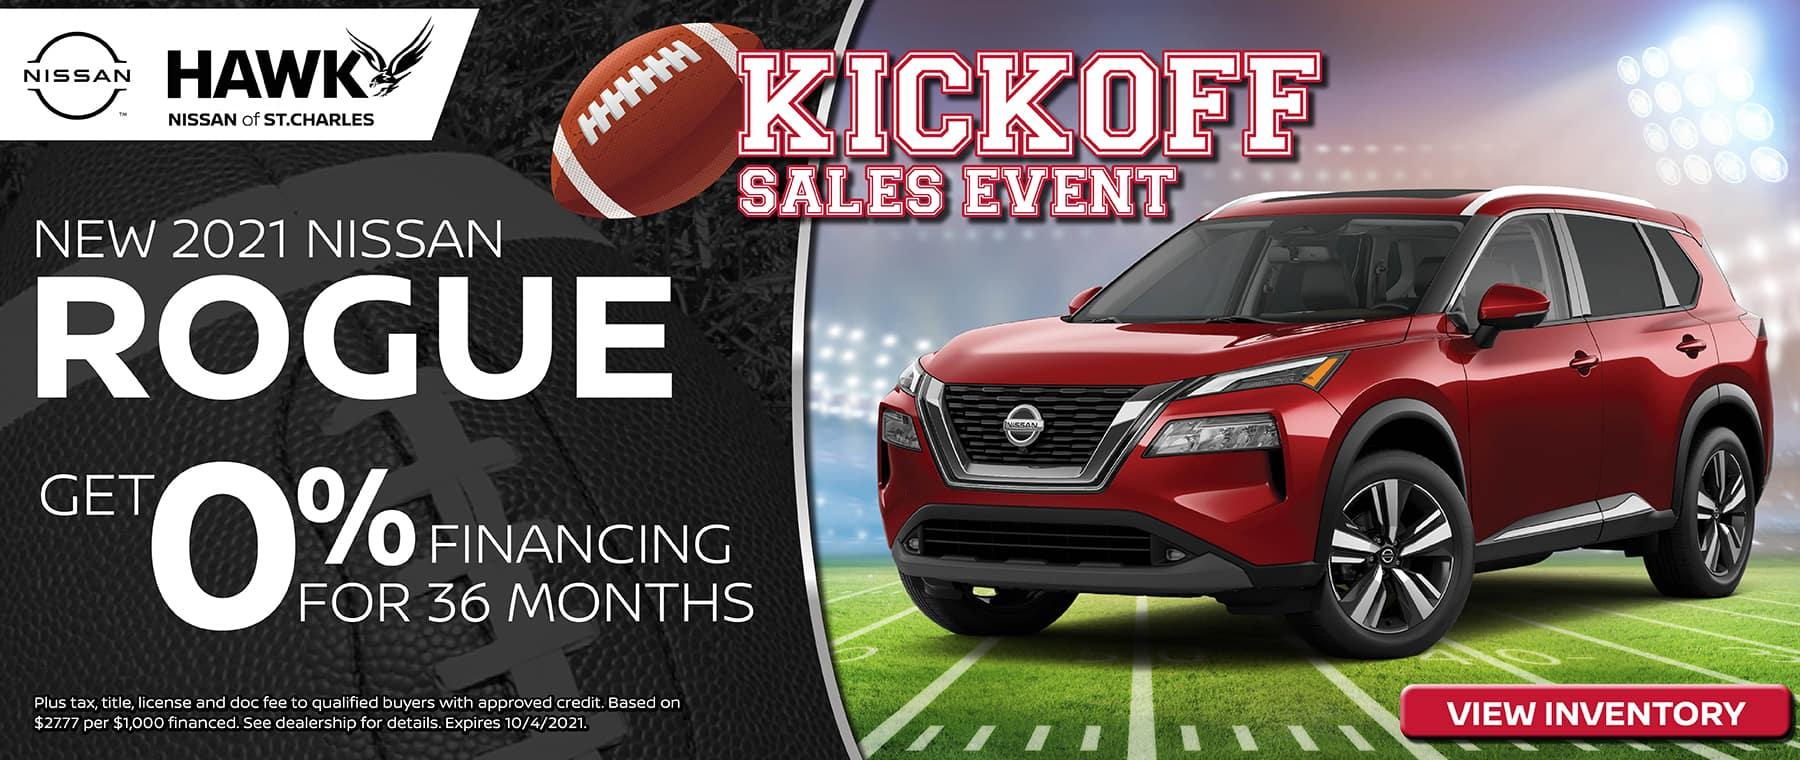 2021 Nissan Rogue Finance Offer | Hawk Nissan St. Charles